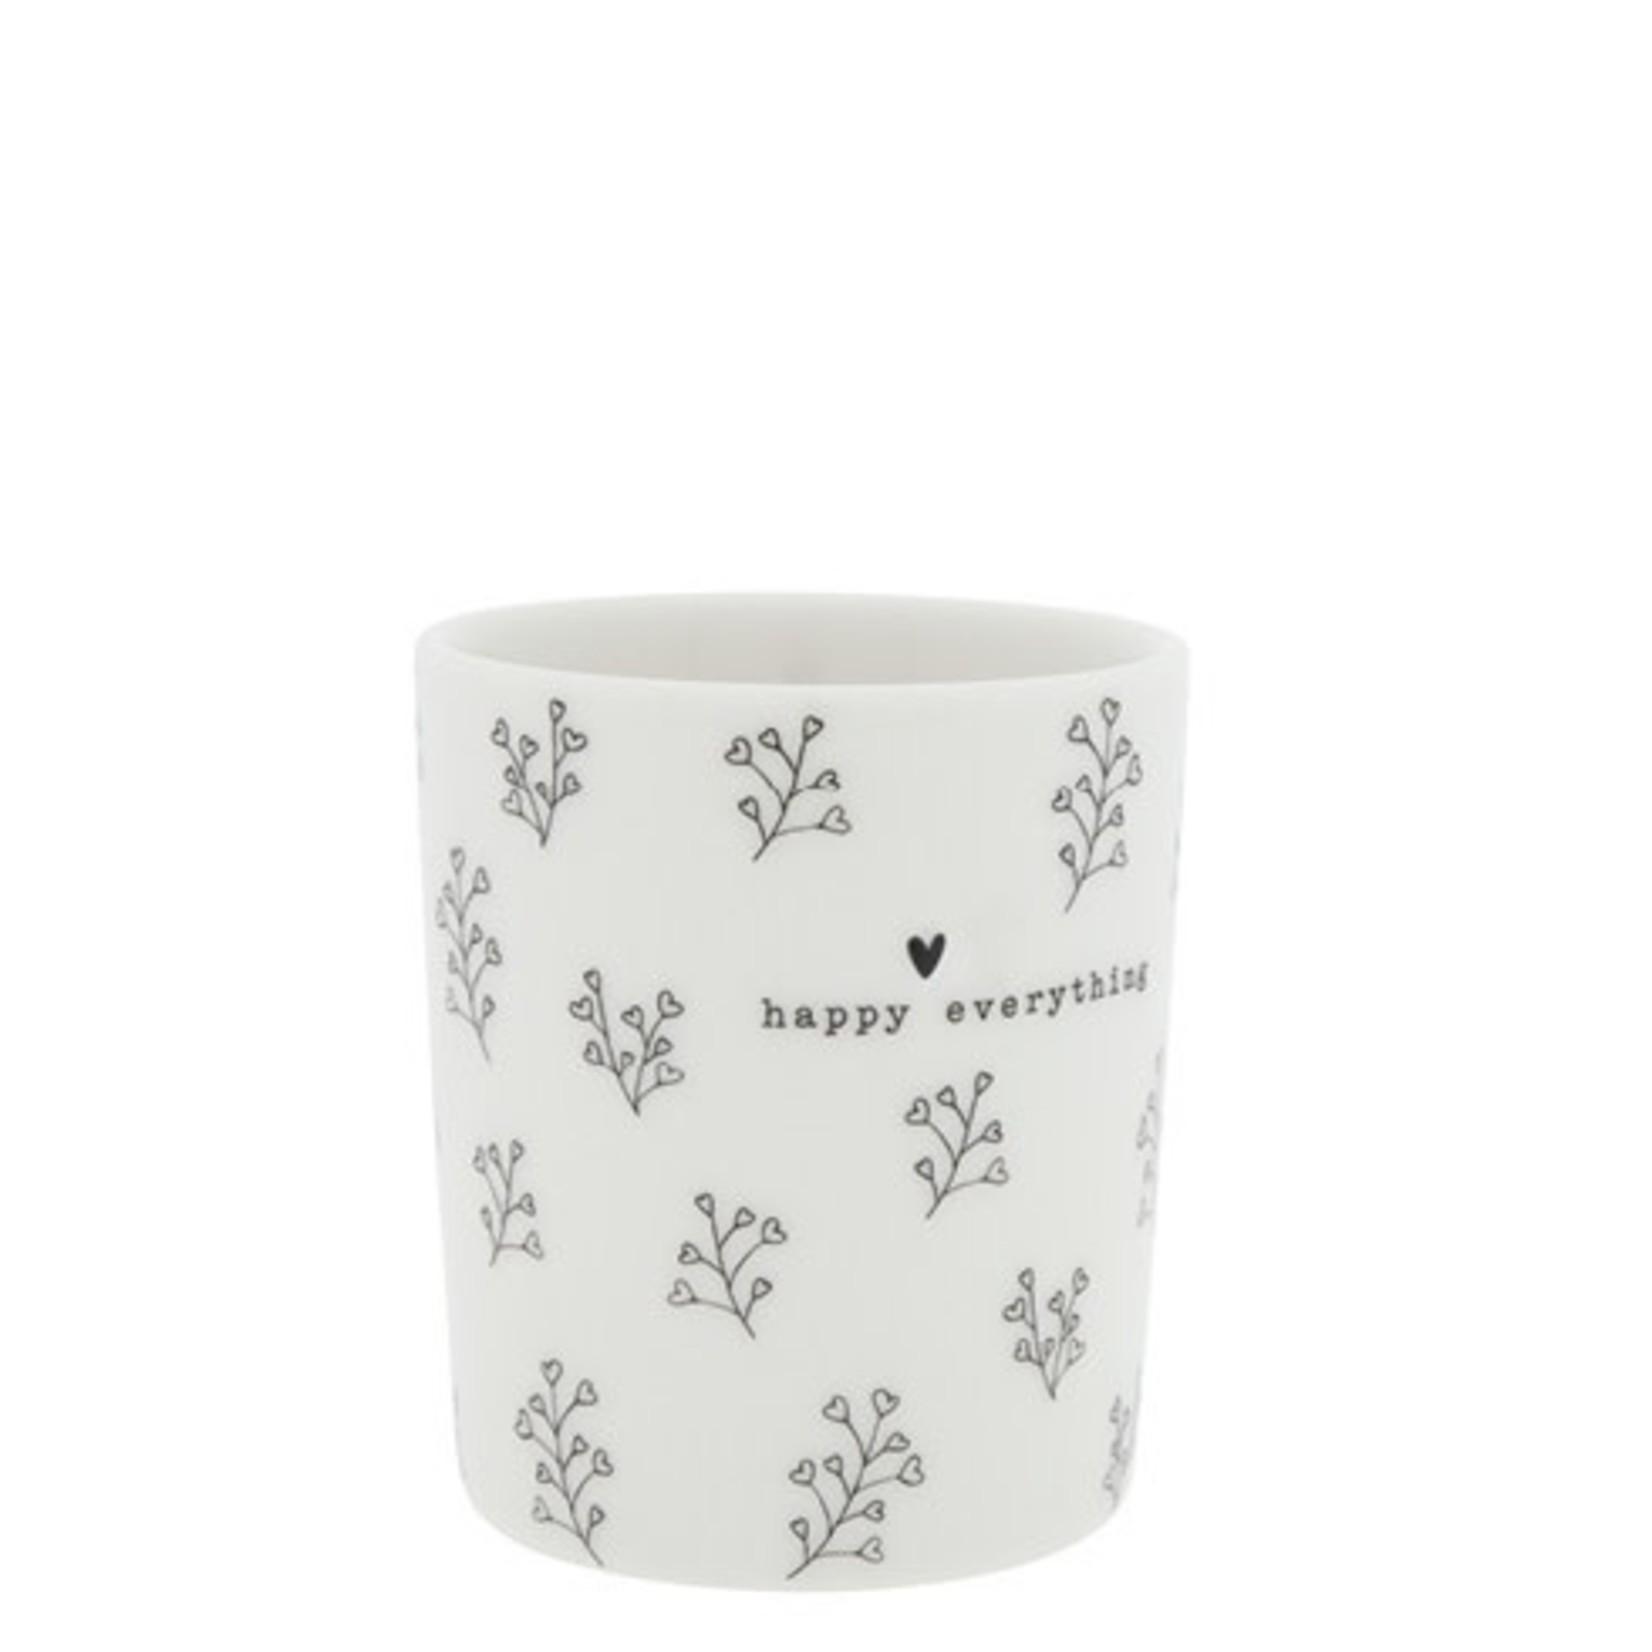 Bastion Collections Mug Happy everything flowers white/black 8x8x9 cm